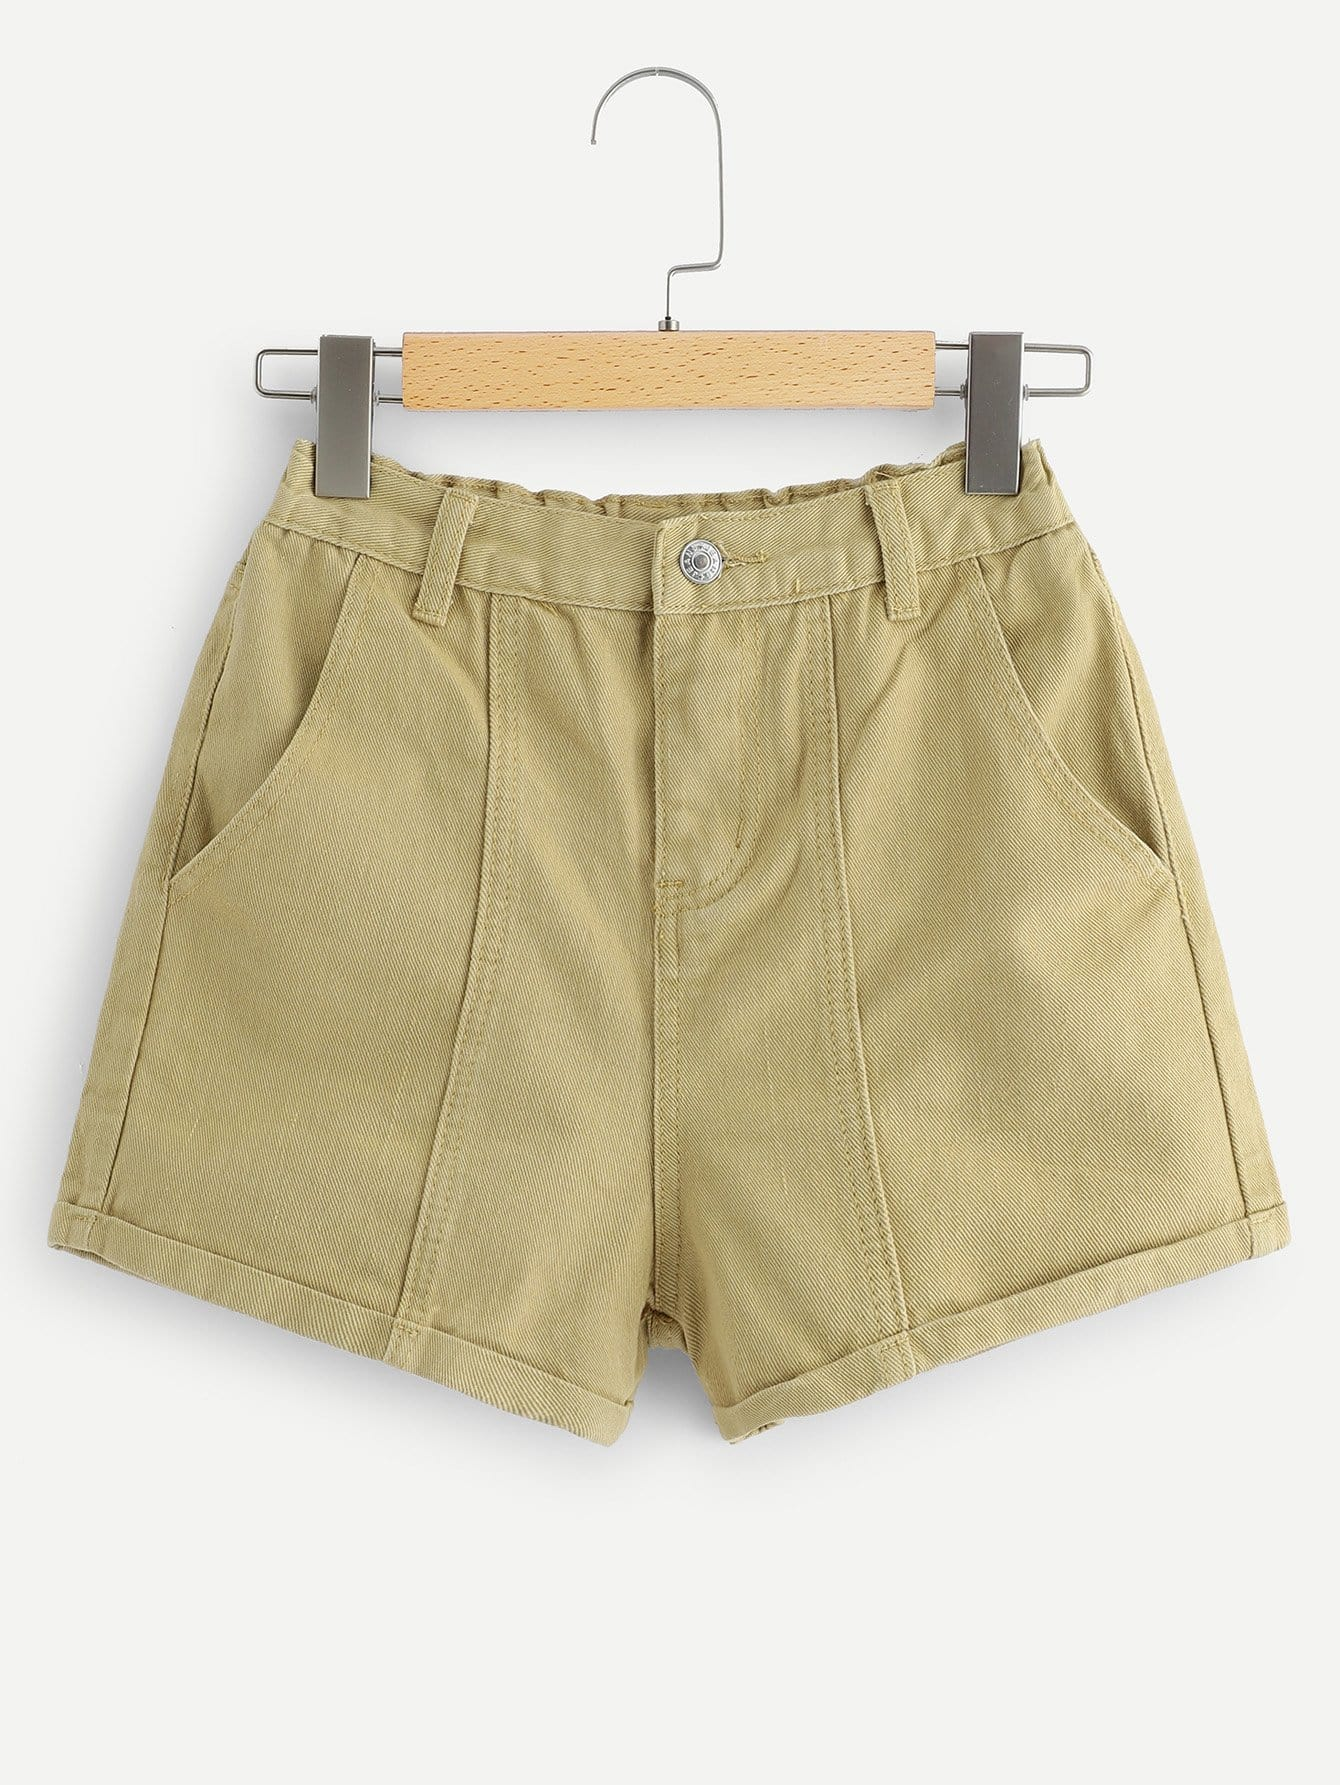 Rolled Hem Solid Denim Shorts